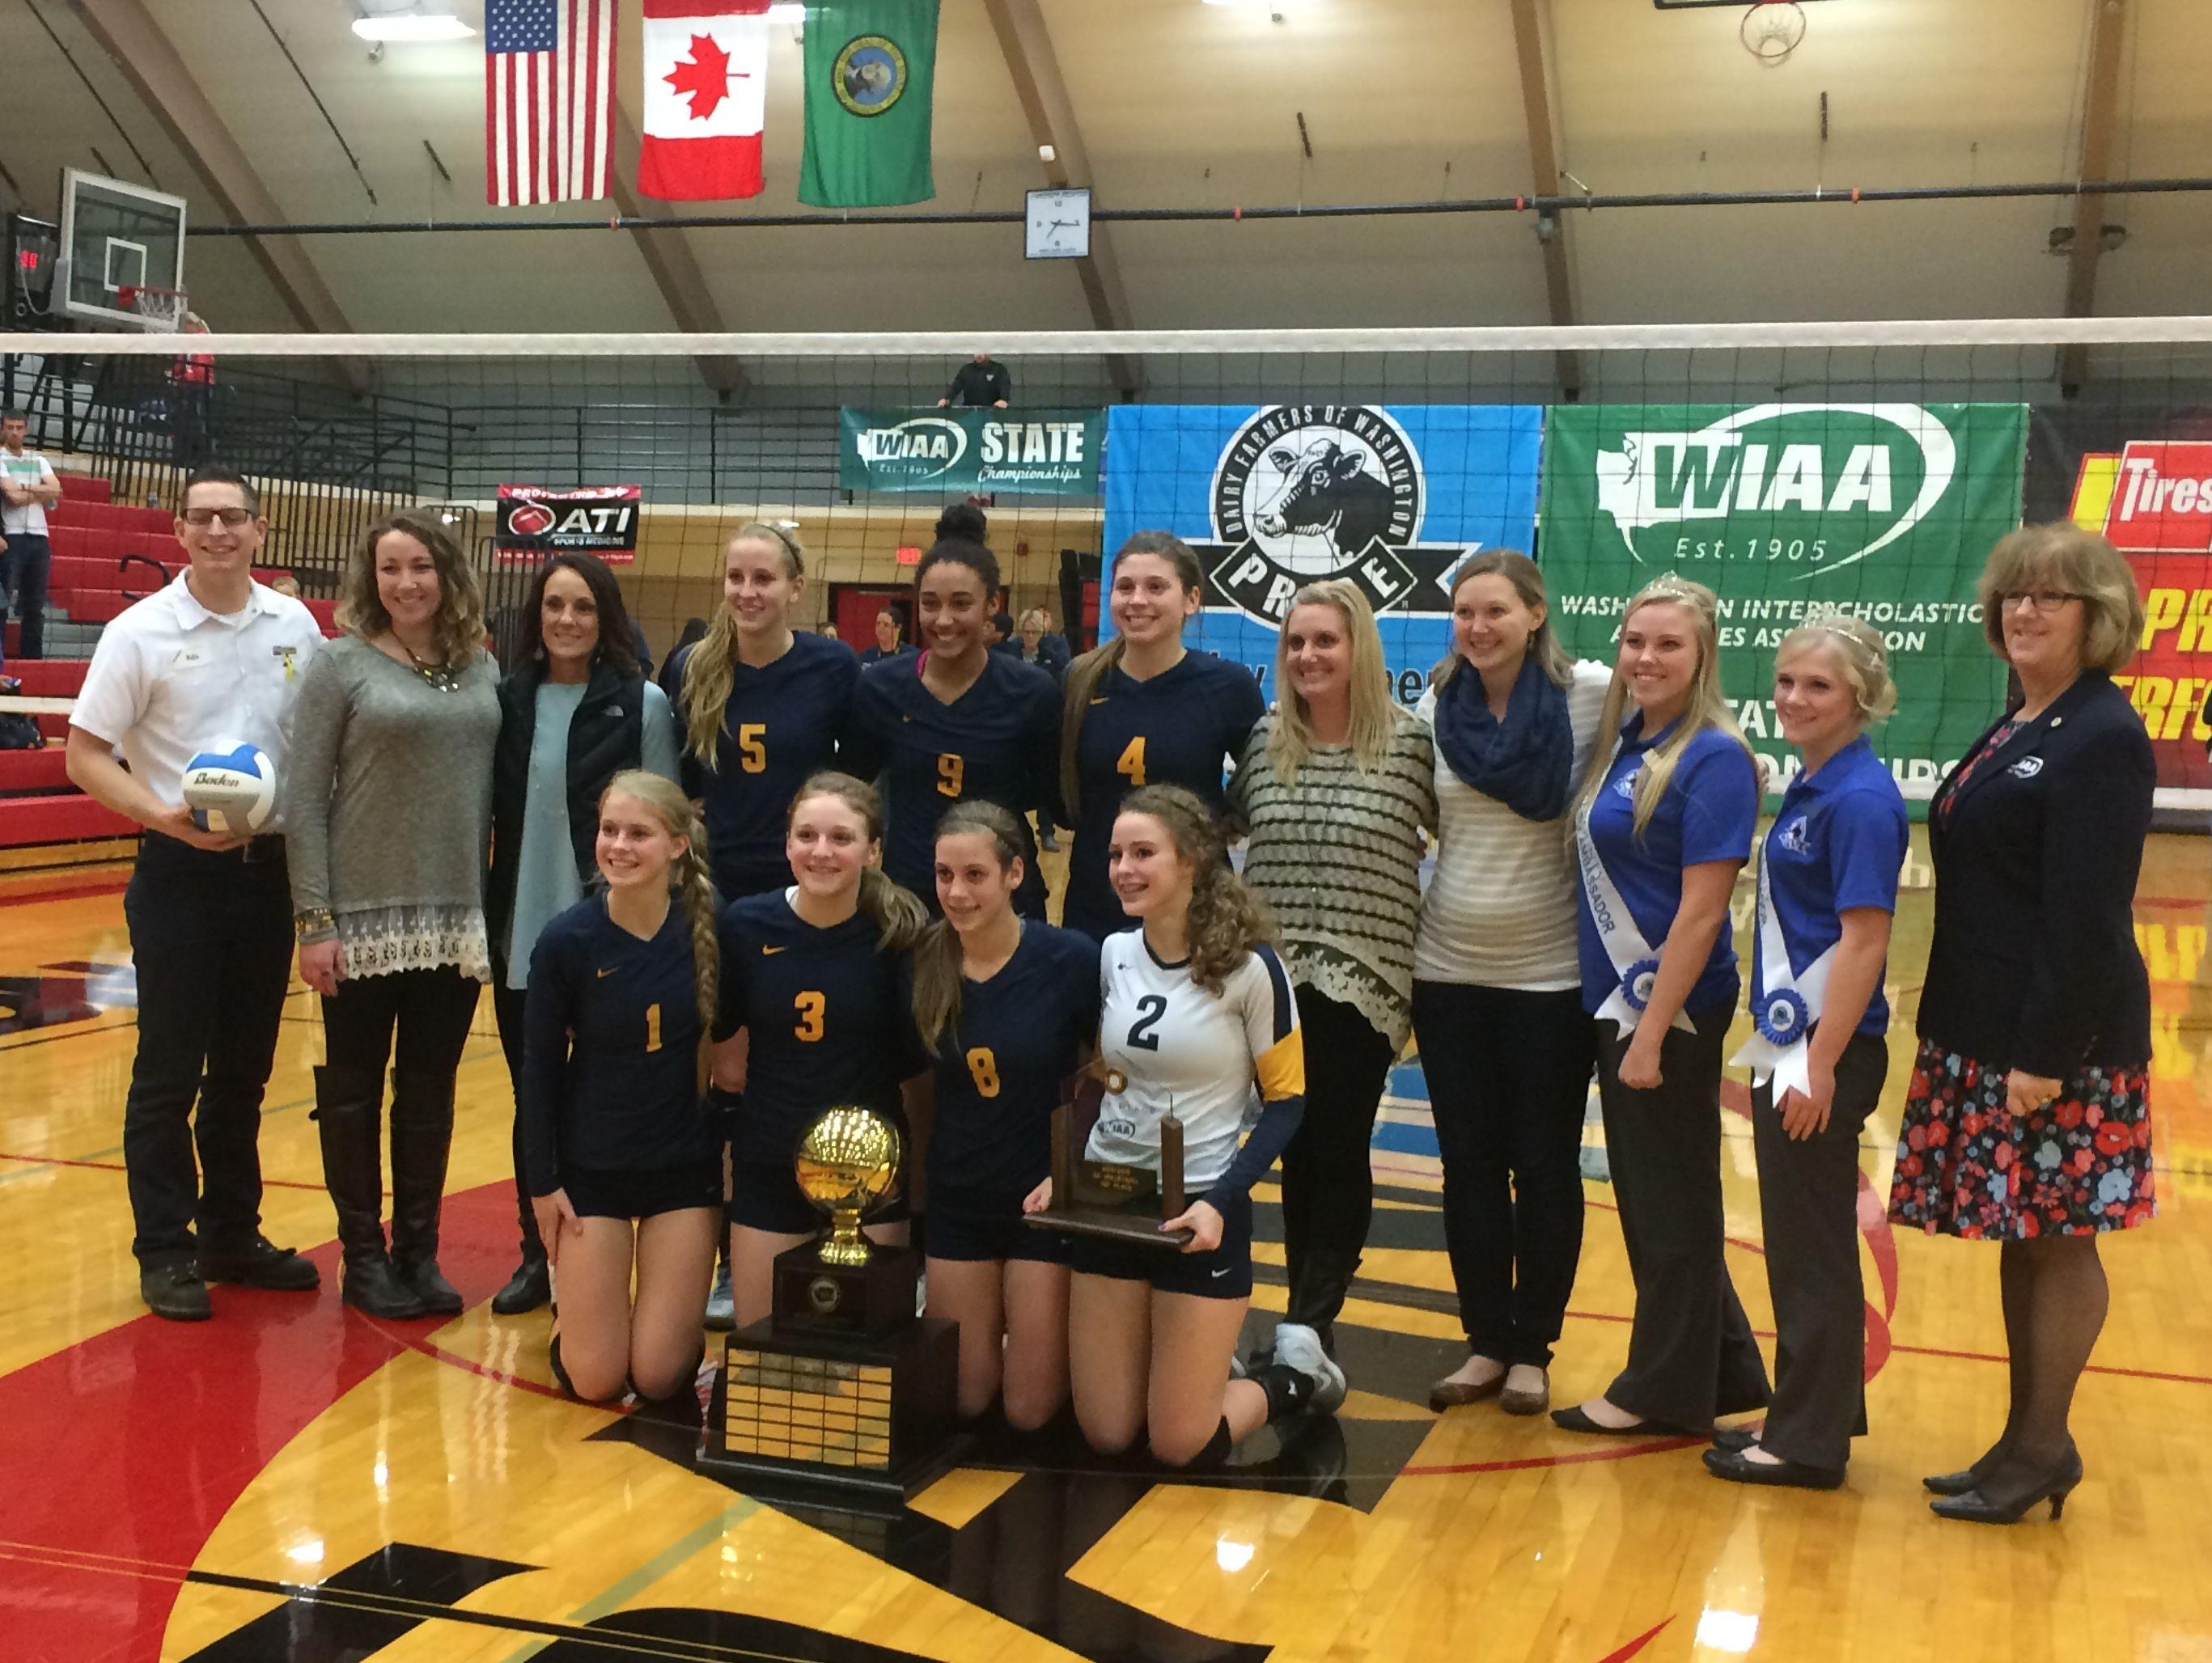 Burlington-Edison volleyball won the 2A state title.